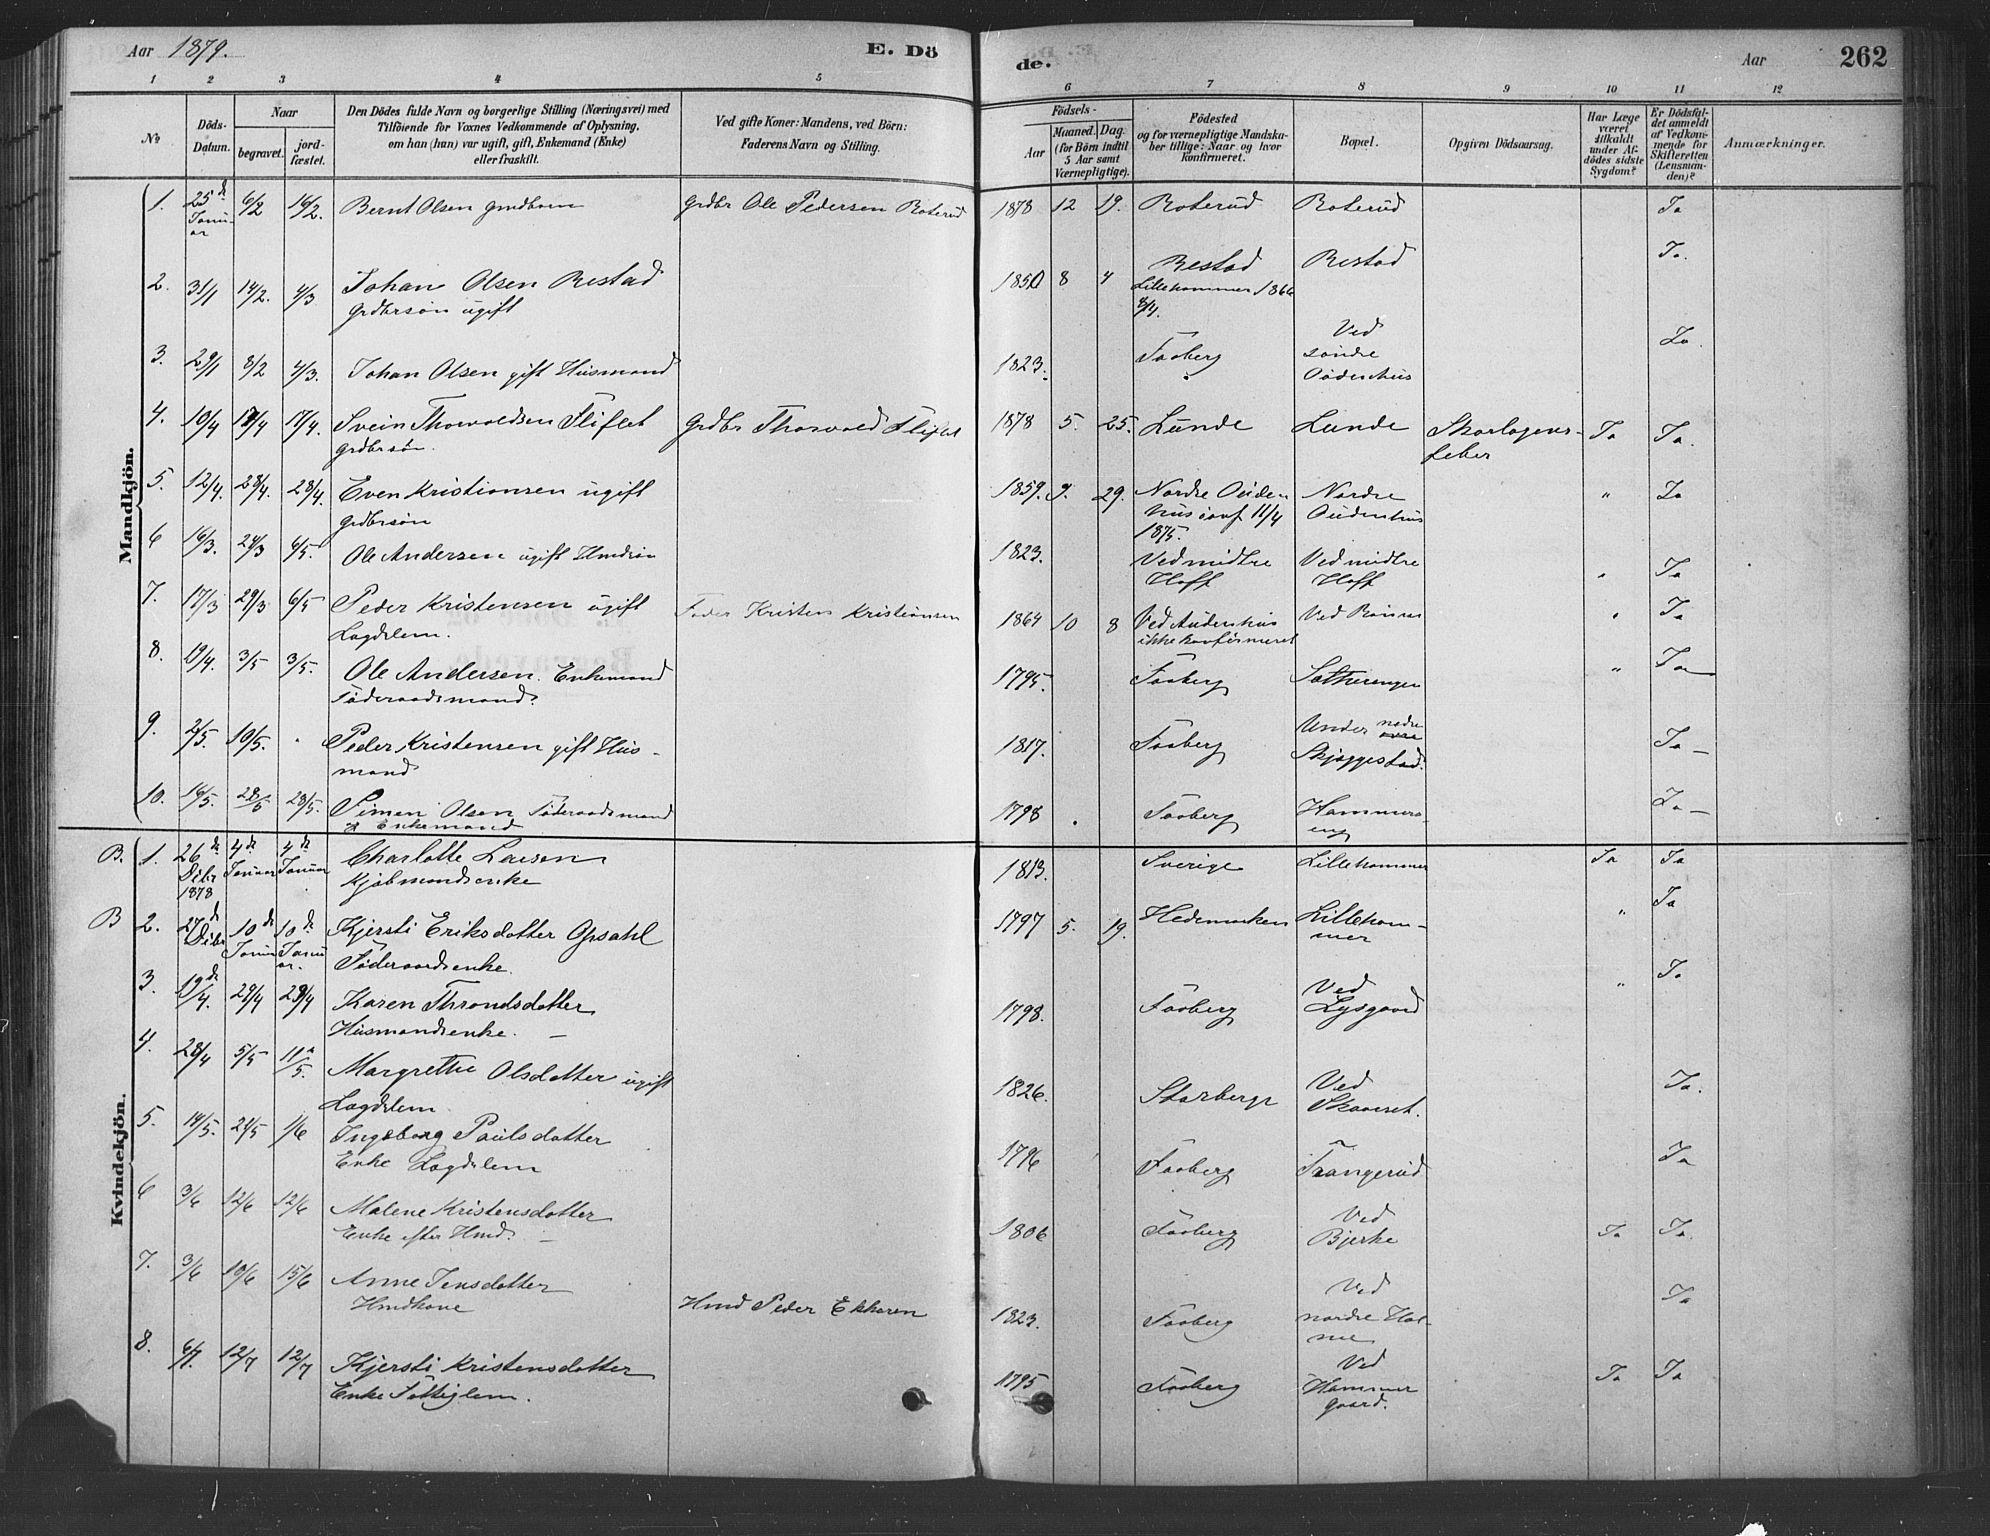 SAH, Fåberg prestekontor, Ministerialbok nr. 9, 1879-1898, s. 262